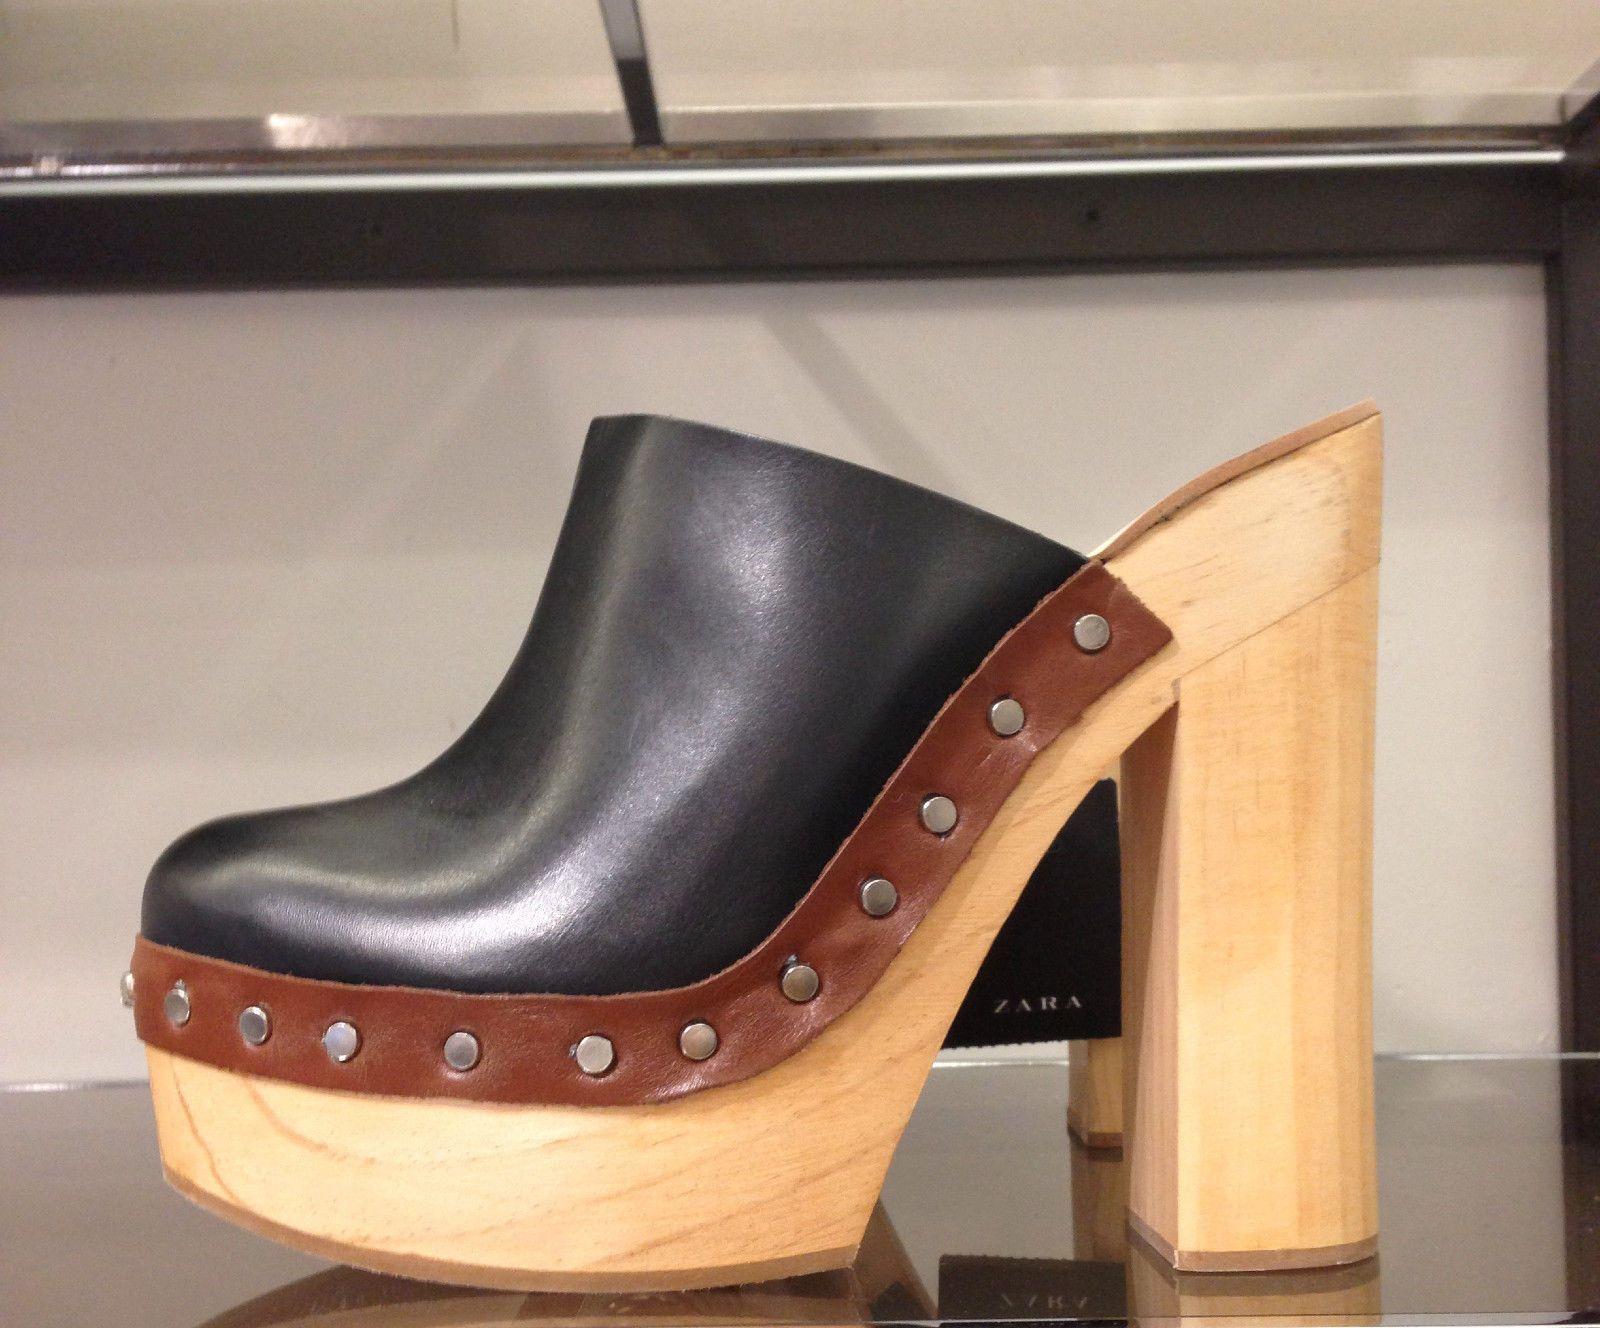 0ceba2b5654 ZARA Leather clogs 36-41 REF. 2568 001